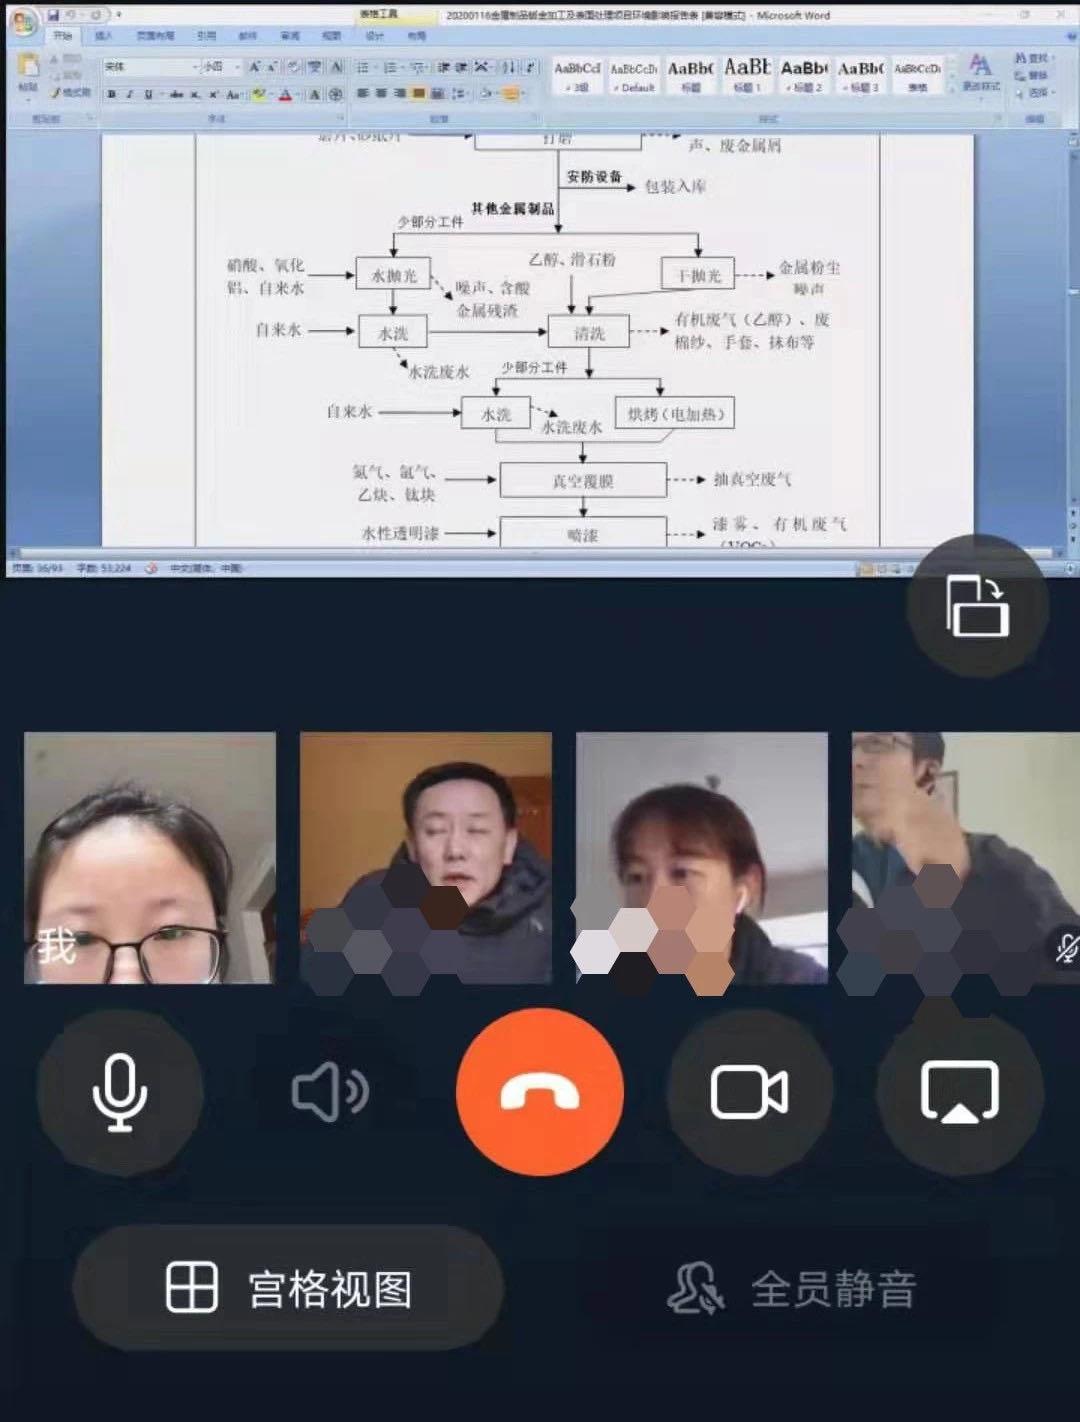 C:\Users\ADMINI~1\AppData\Local\Temp\WeChat Files\feacb68165de39afddada41cfb15f99.jpg